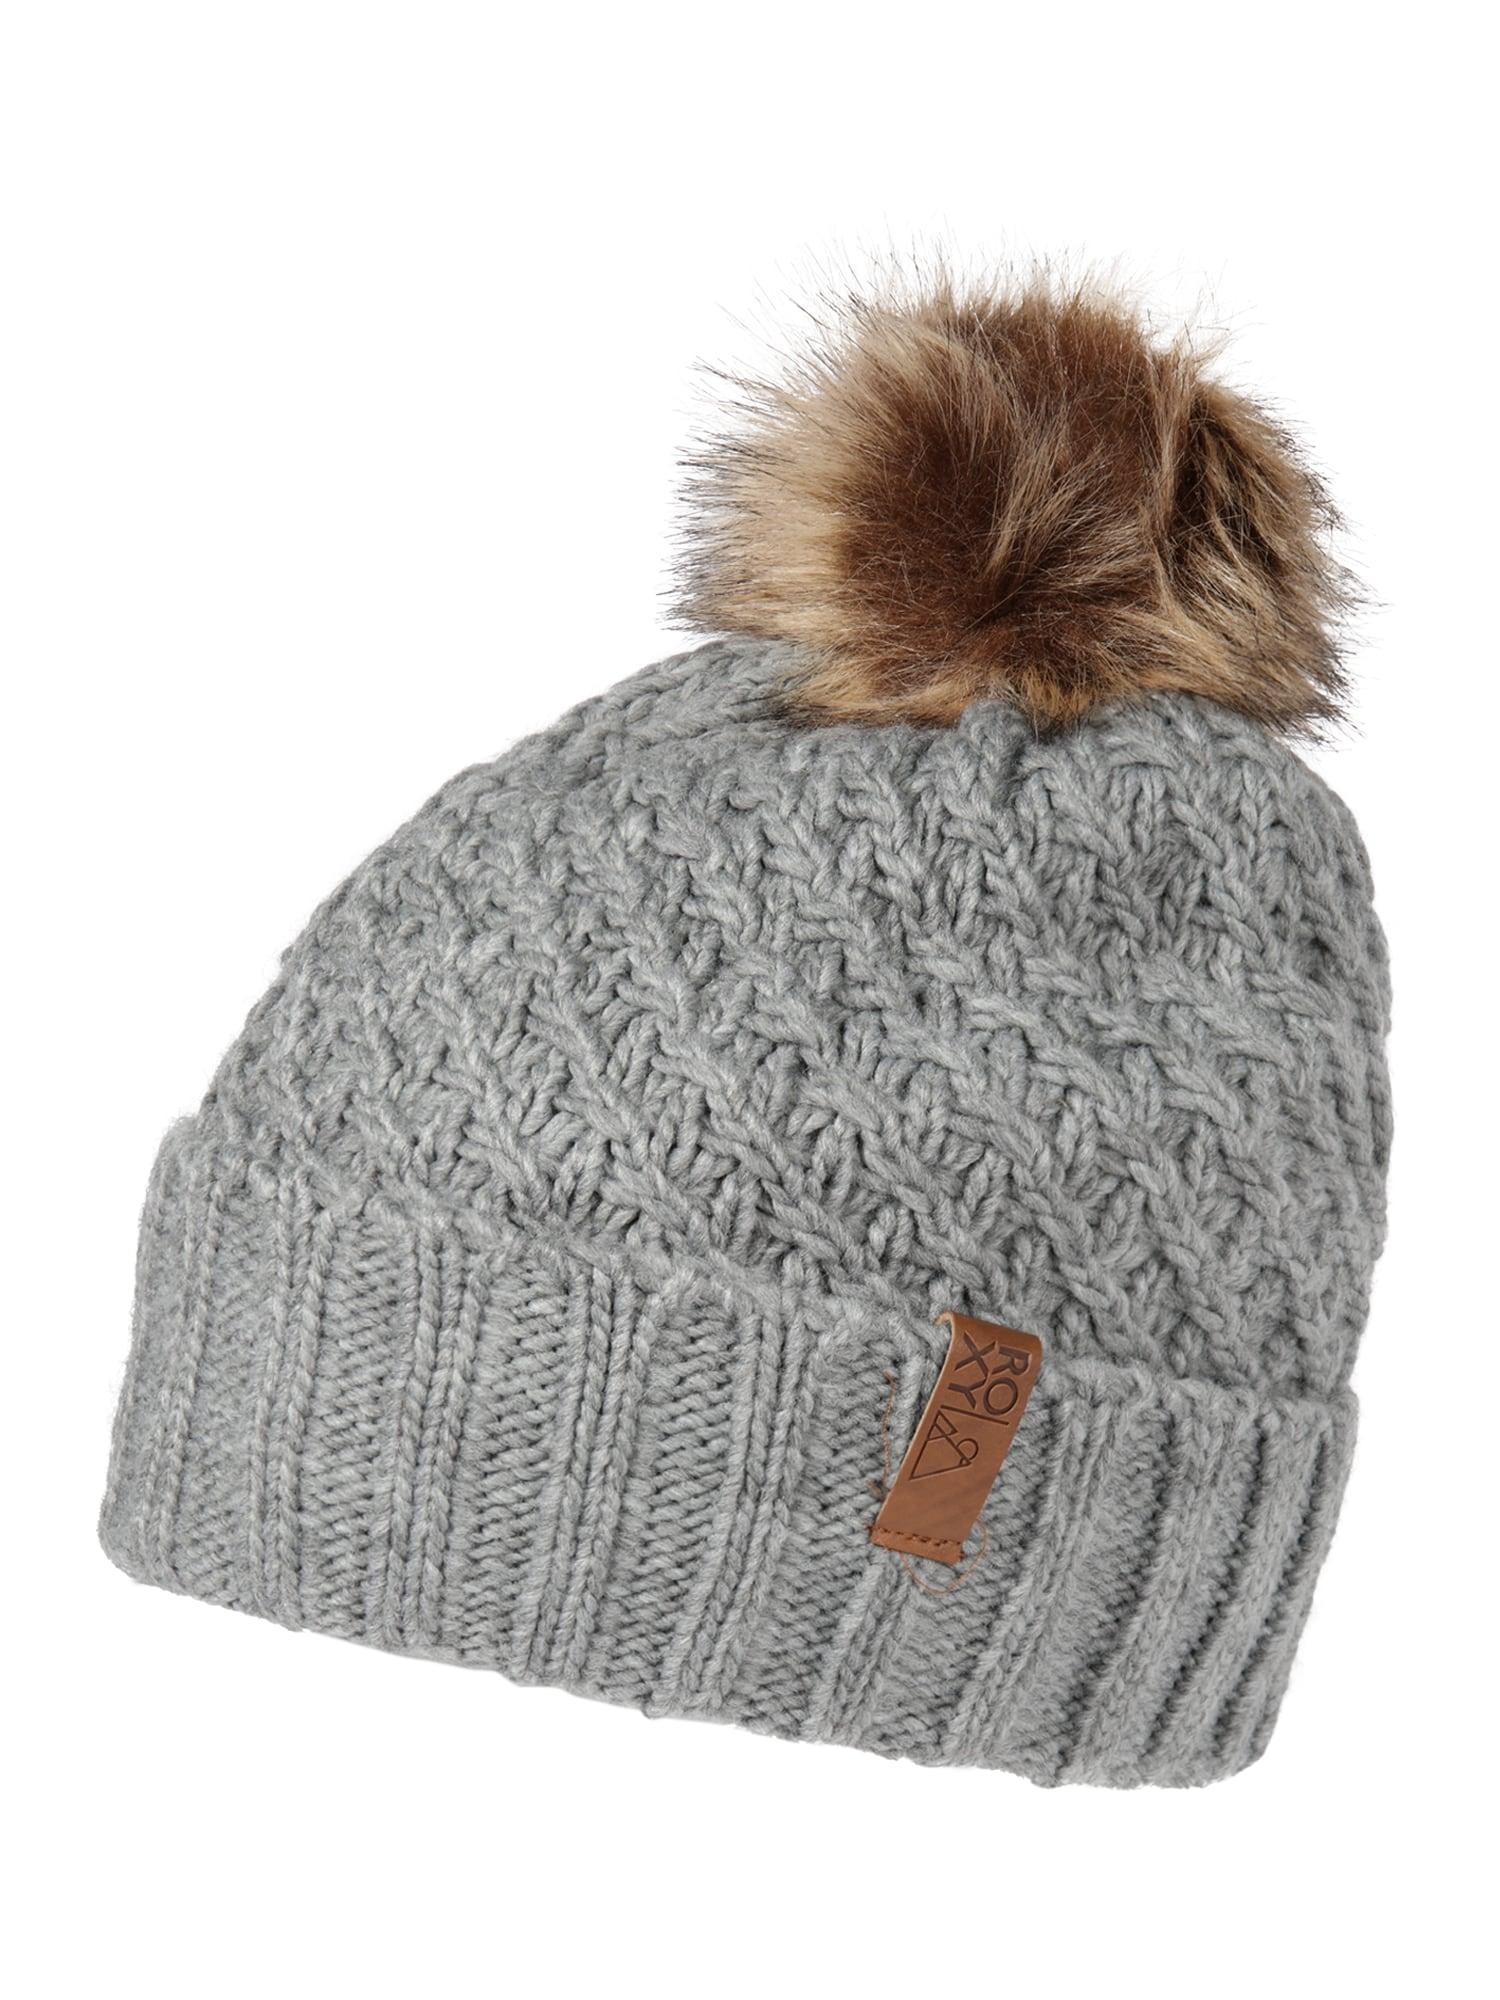 ROXY Sportinė kepurė 'BLIZZARD' pilka